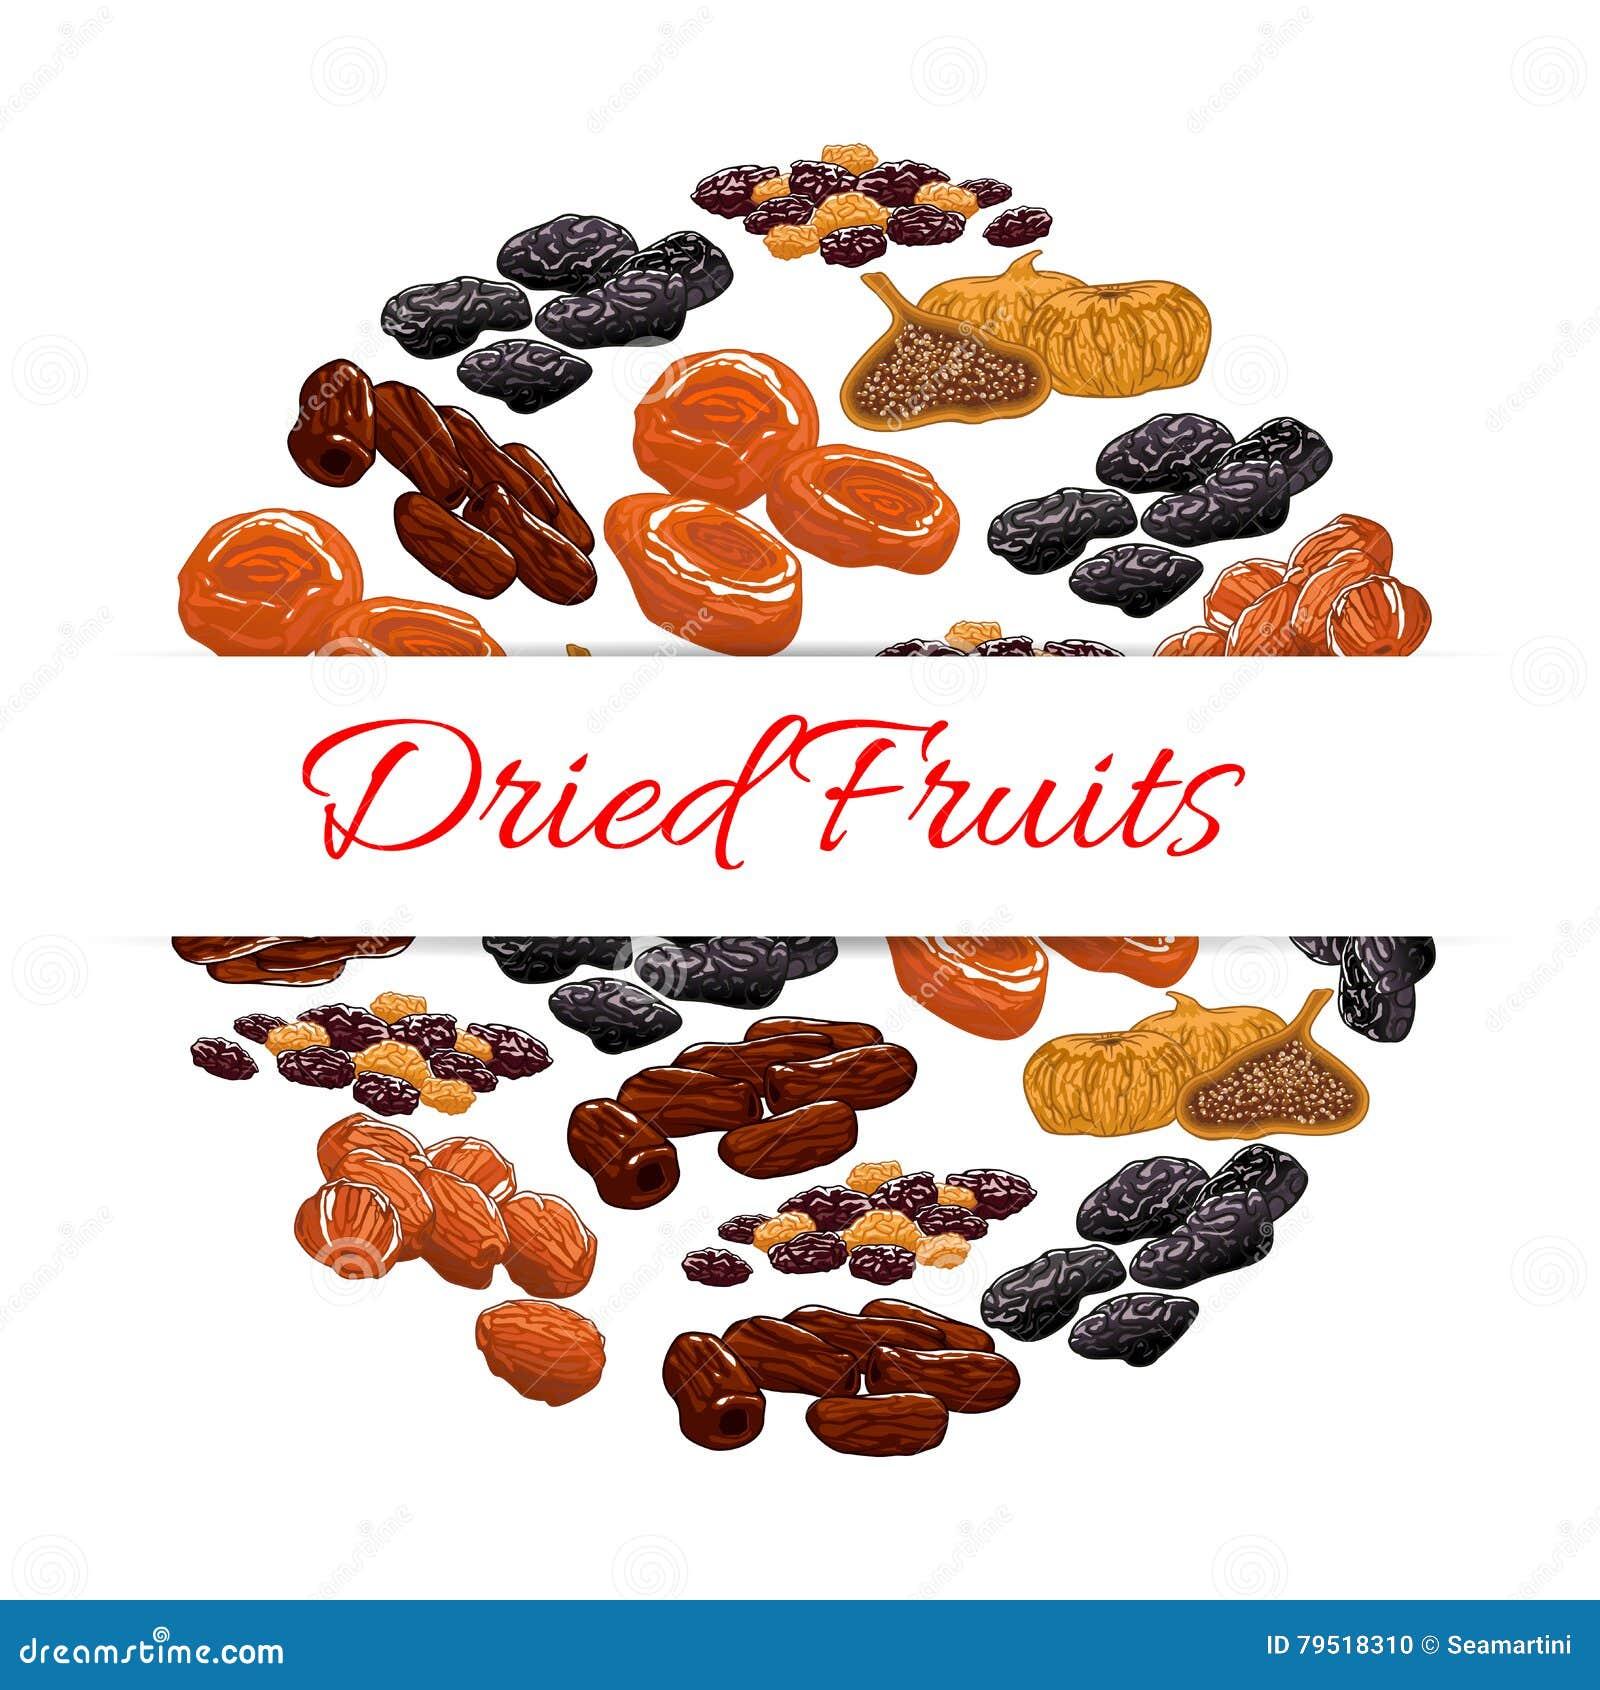 Dried fruits product emblem